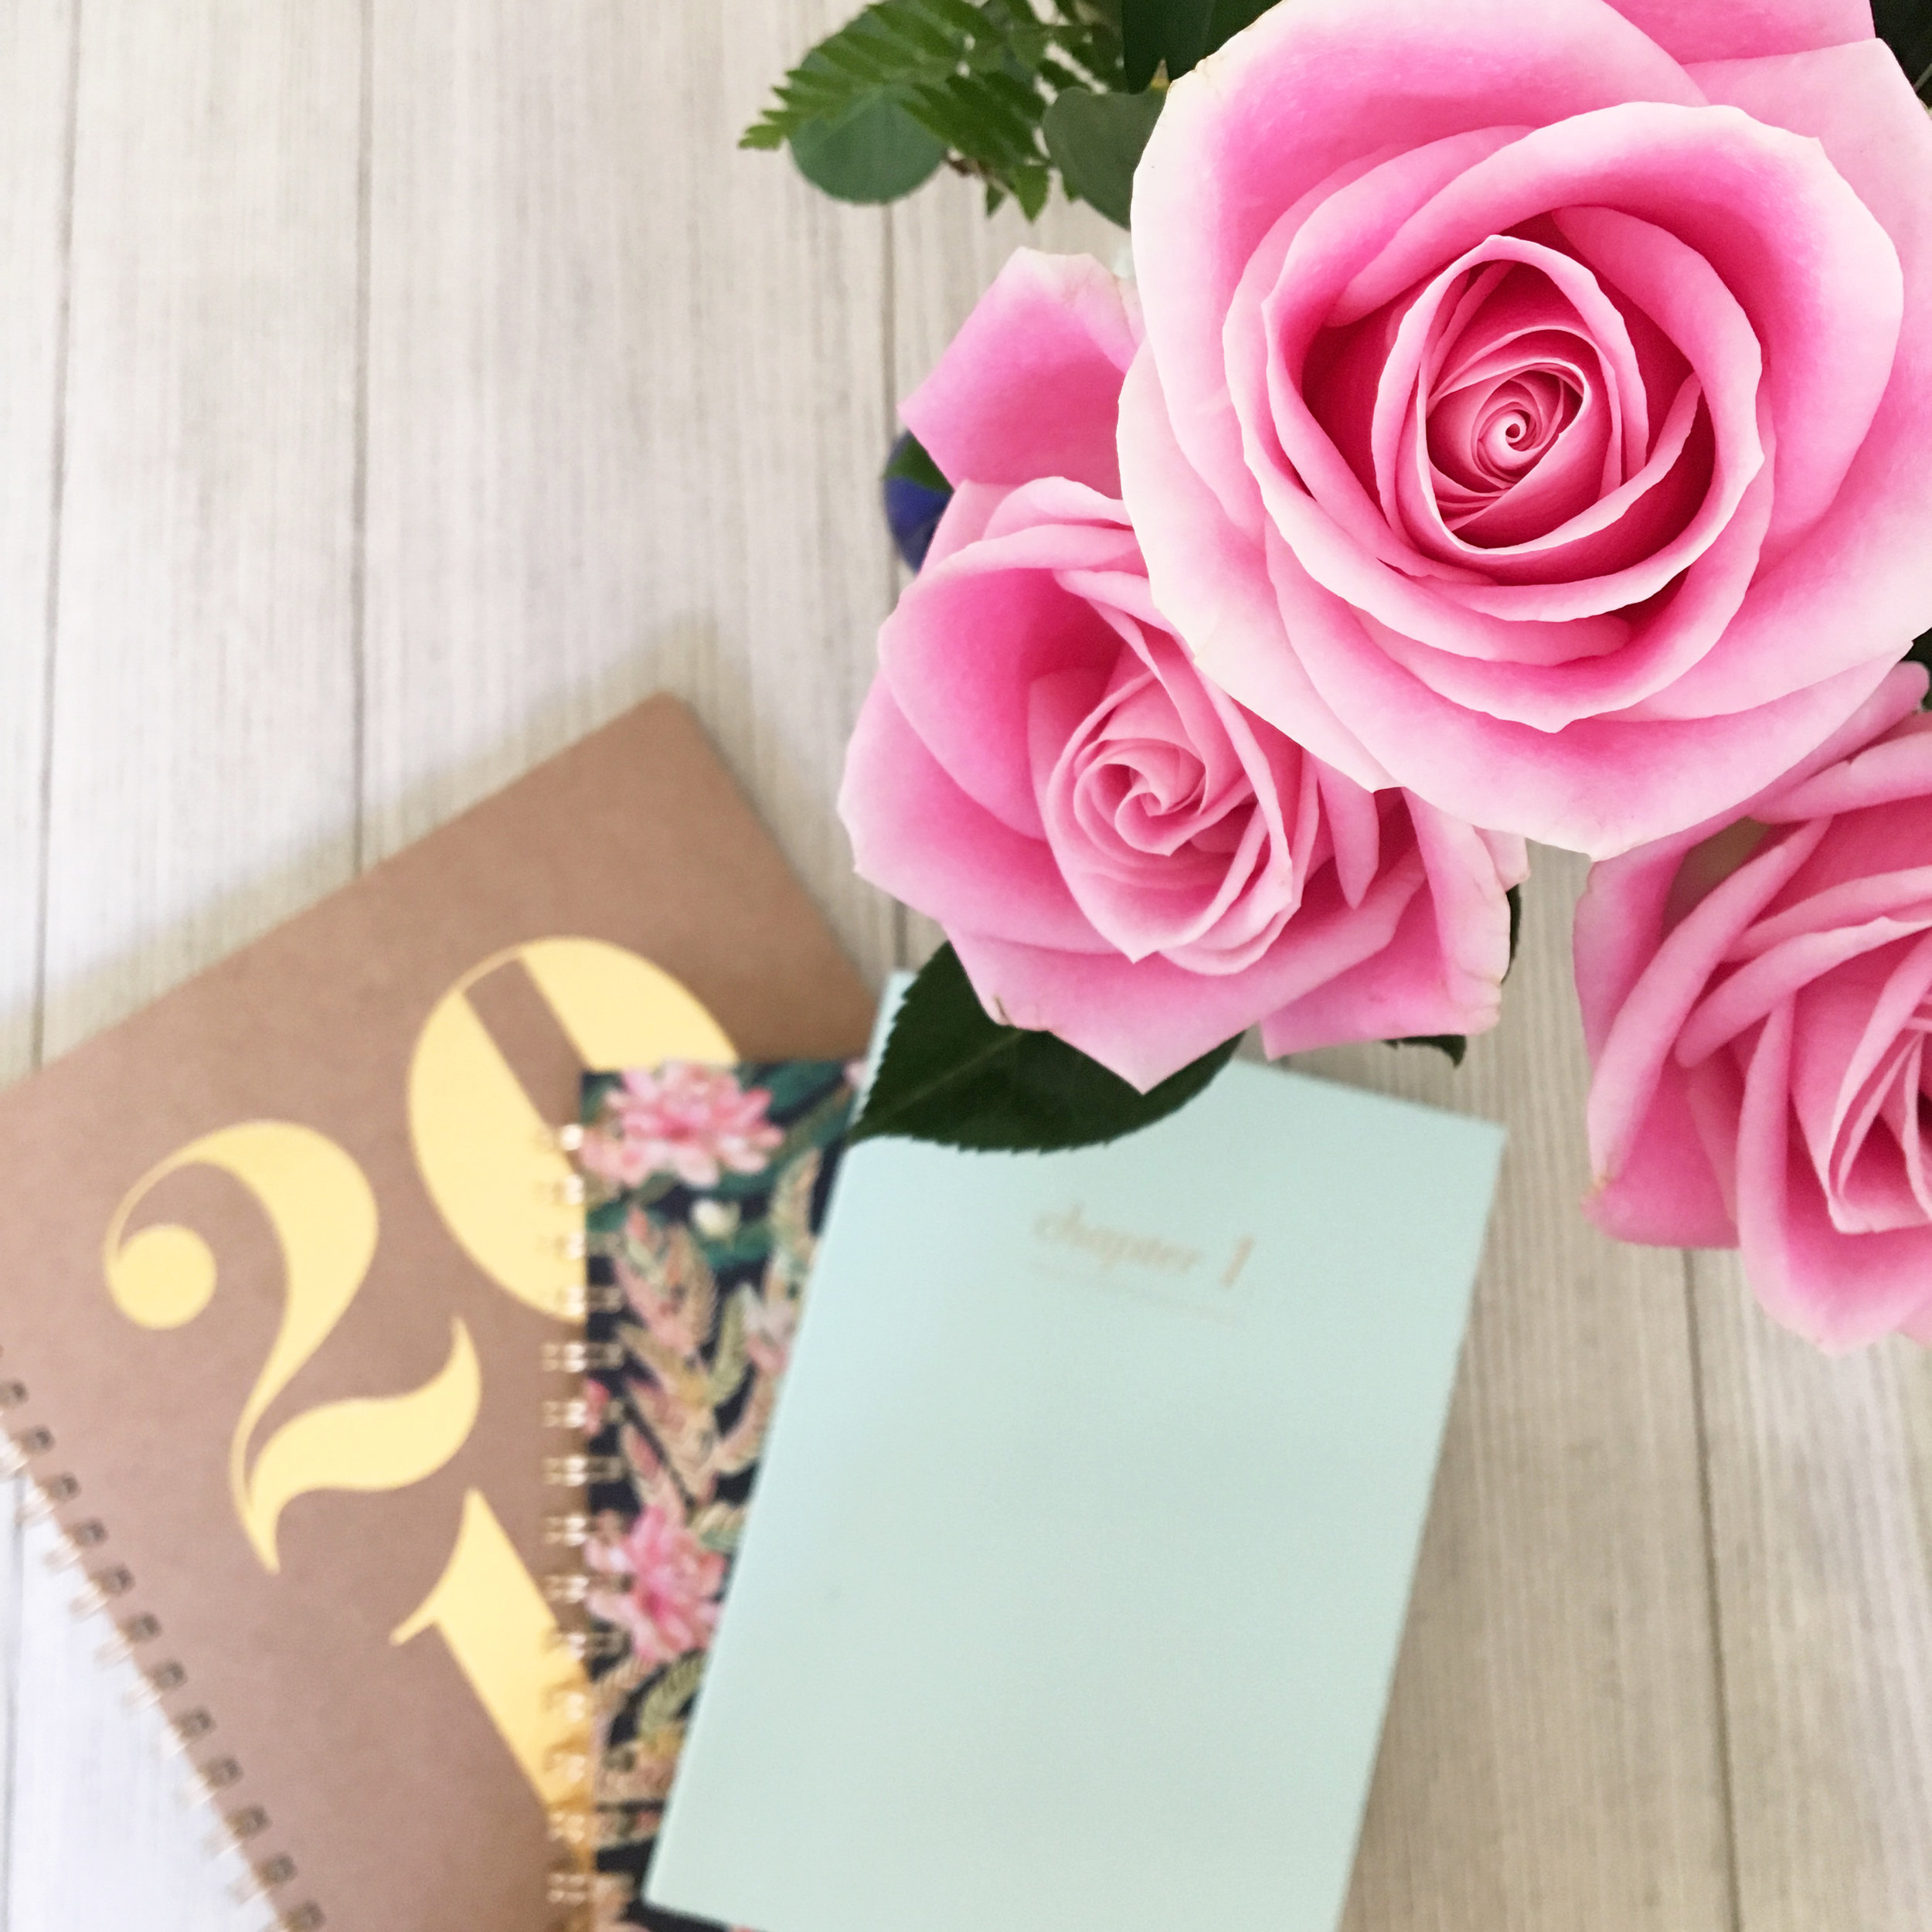 August Goals | Lettered Life Goal Setting 2017